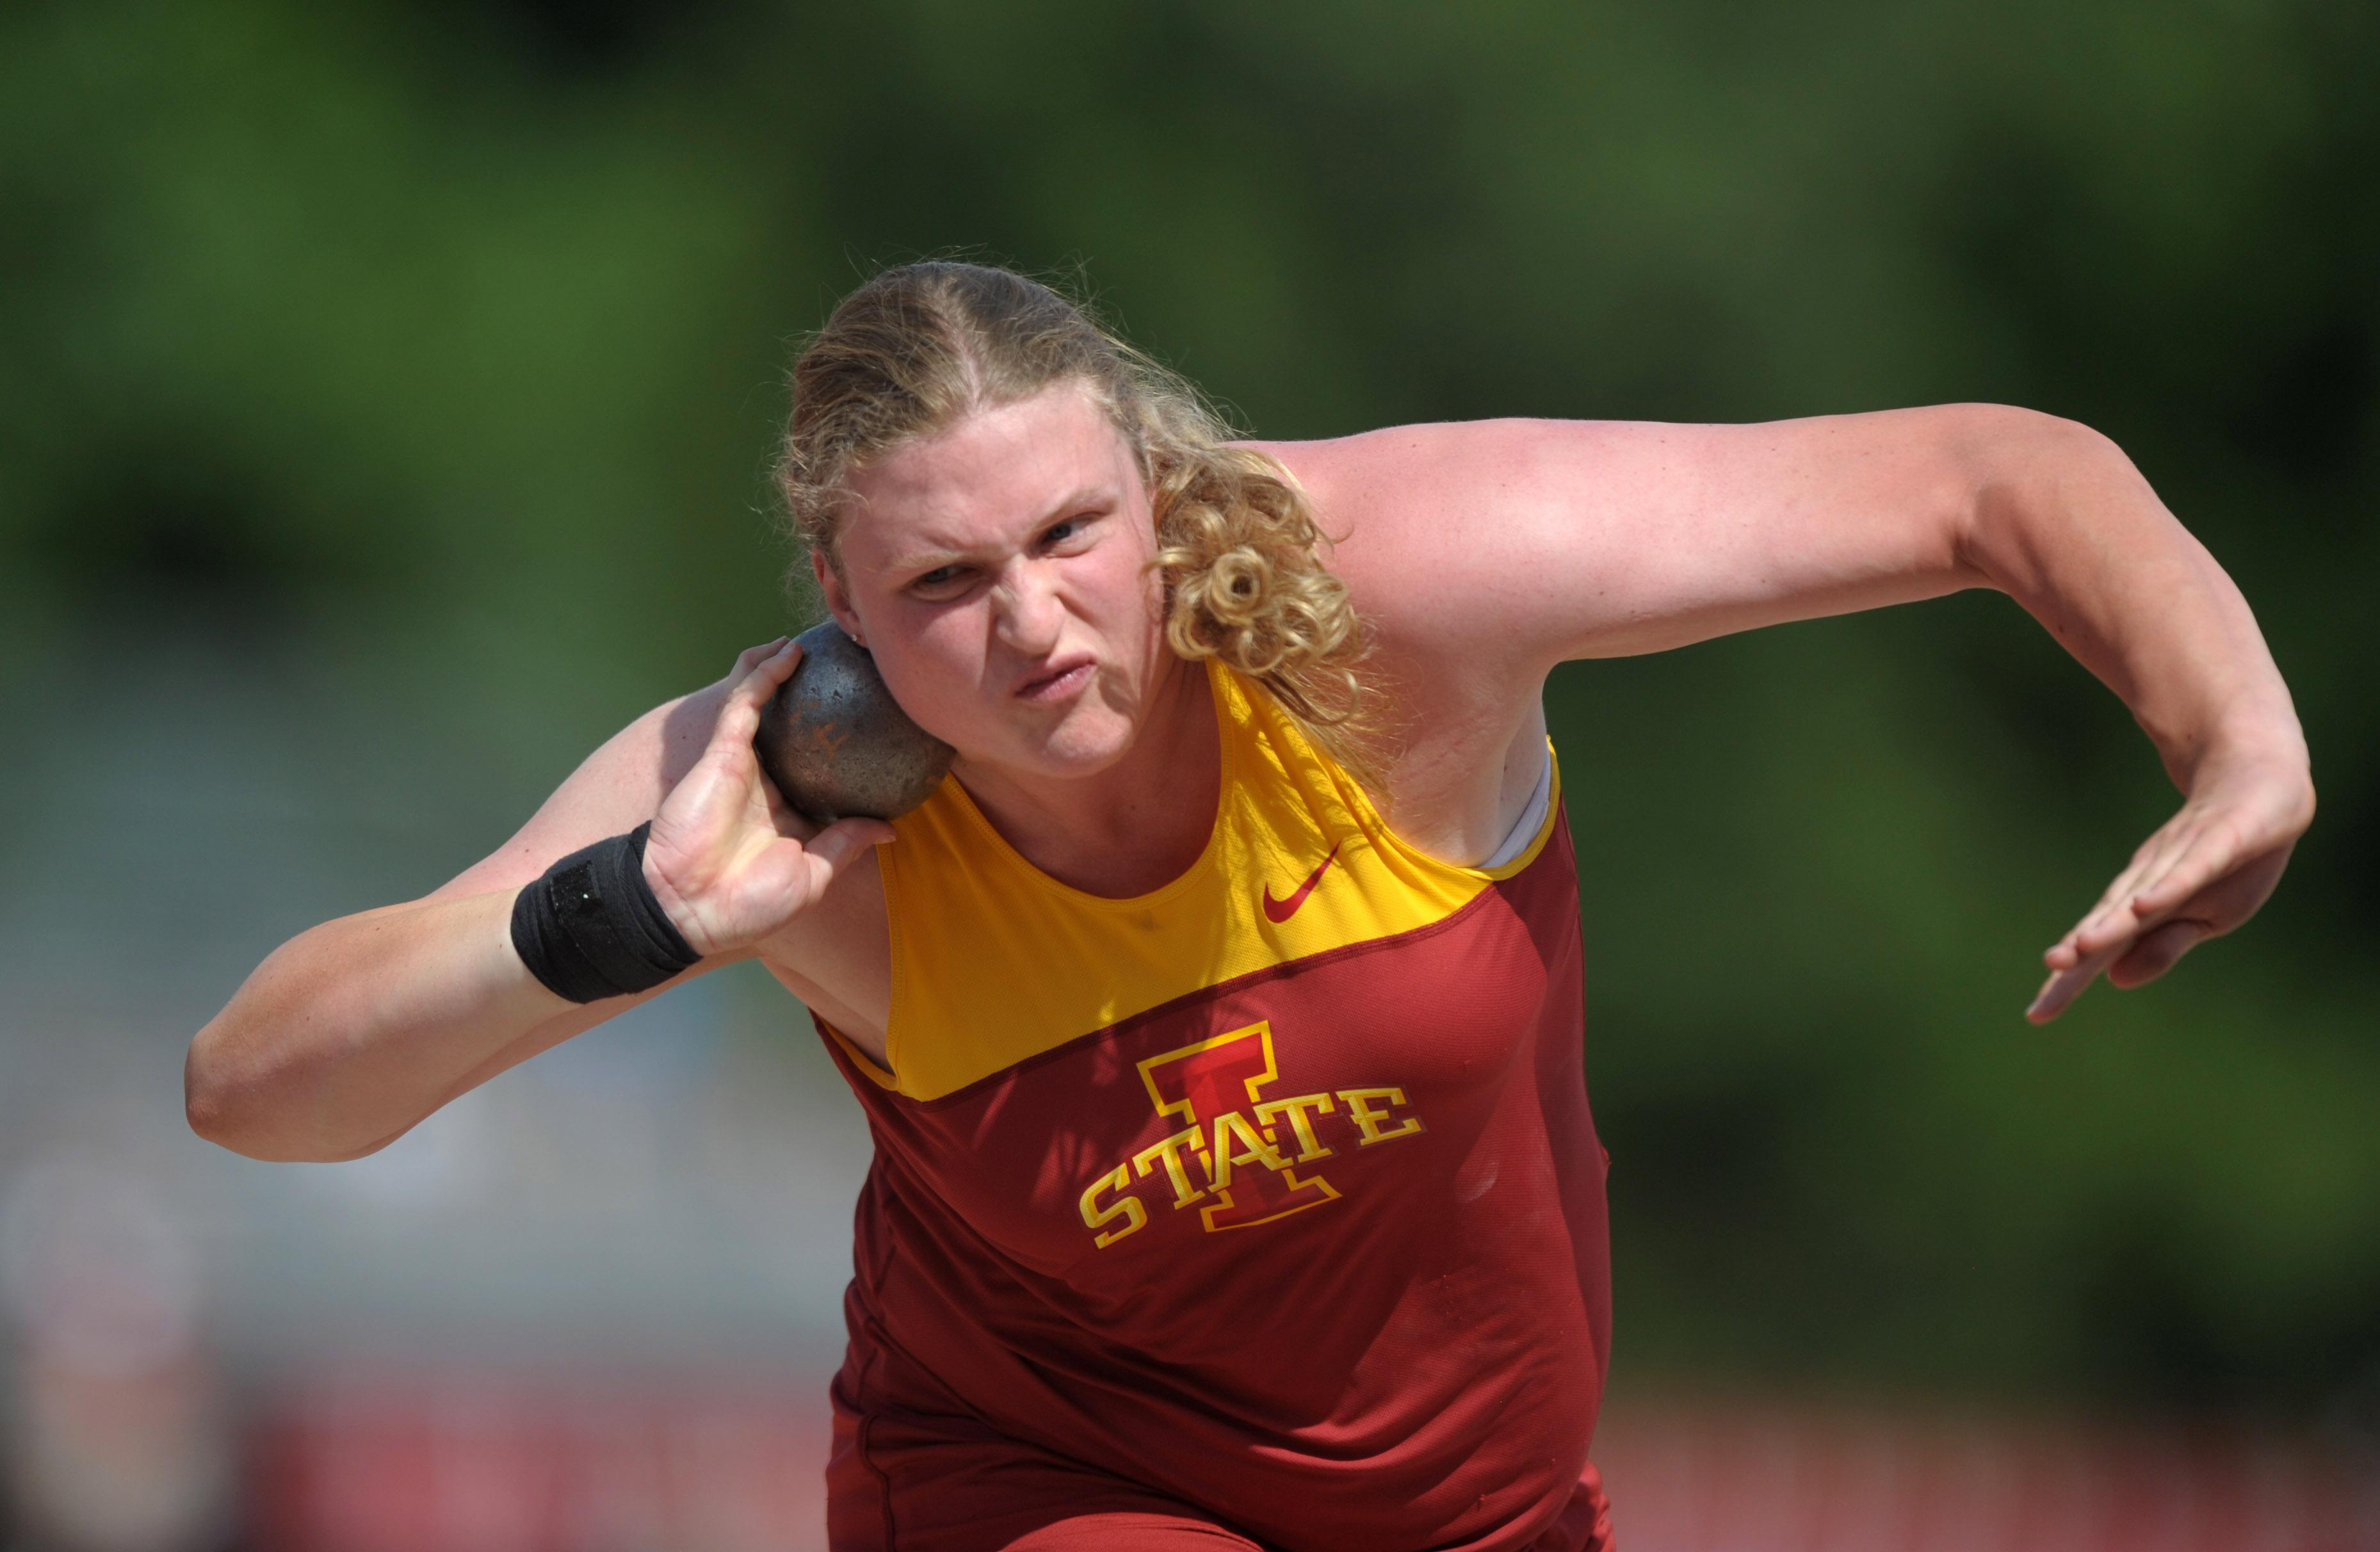 St. Thomas More graduate Christina Hillman wins the women?s shot put at the USA Junior Championships in 2012.